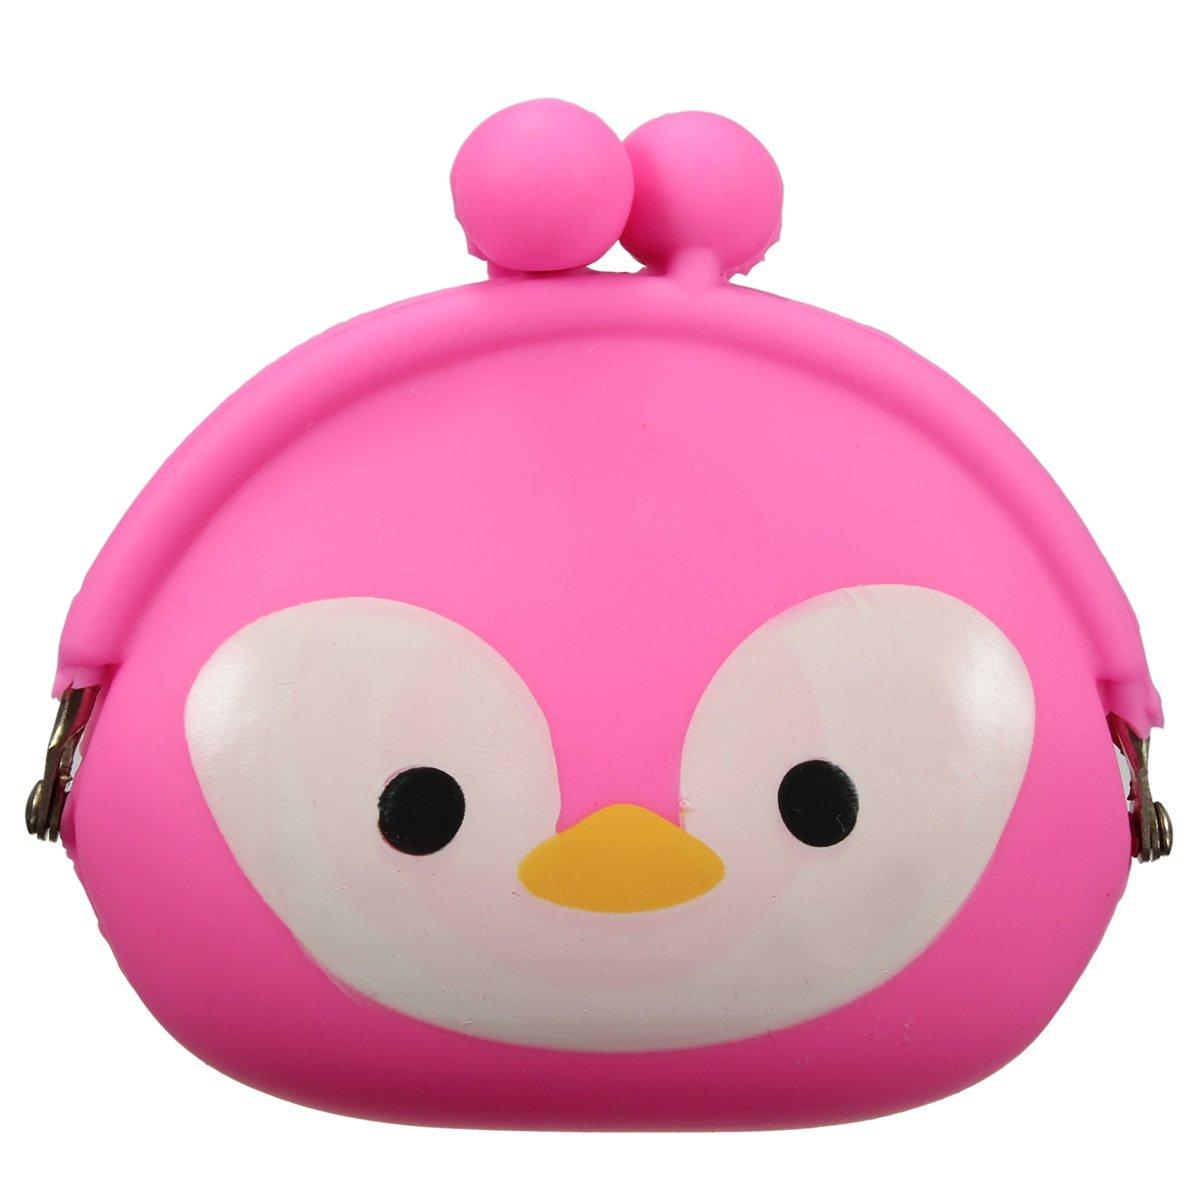 5x Women Girls Wallet Kawaii Cute Cartoon Animal Silicone Jelly Coin Bag Purse Kids Gift Penguin